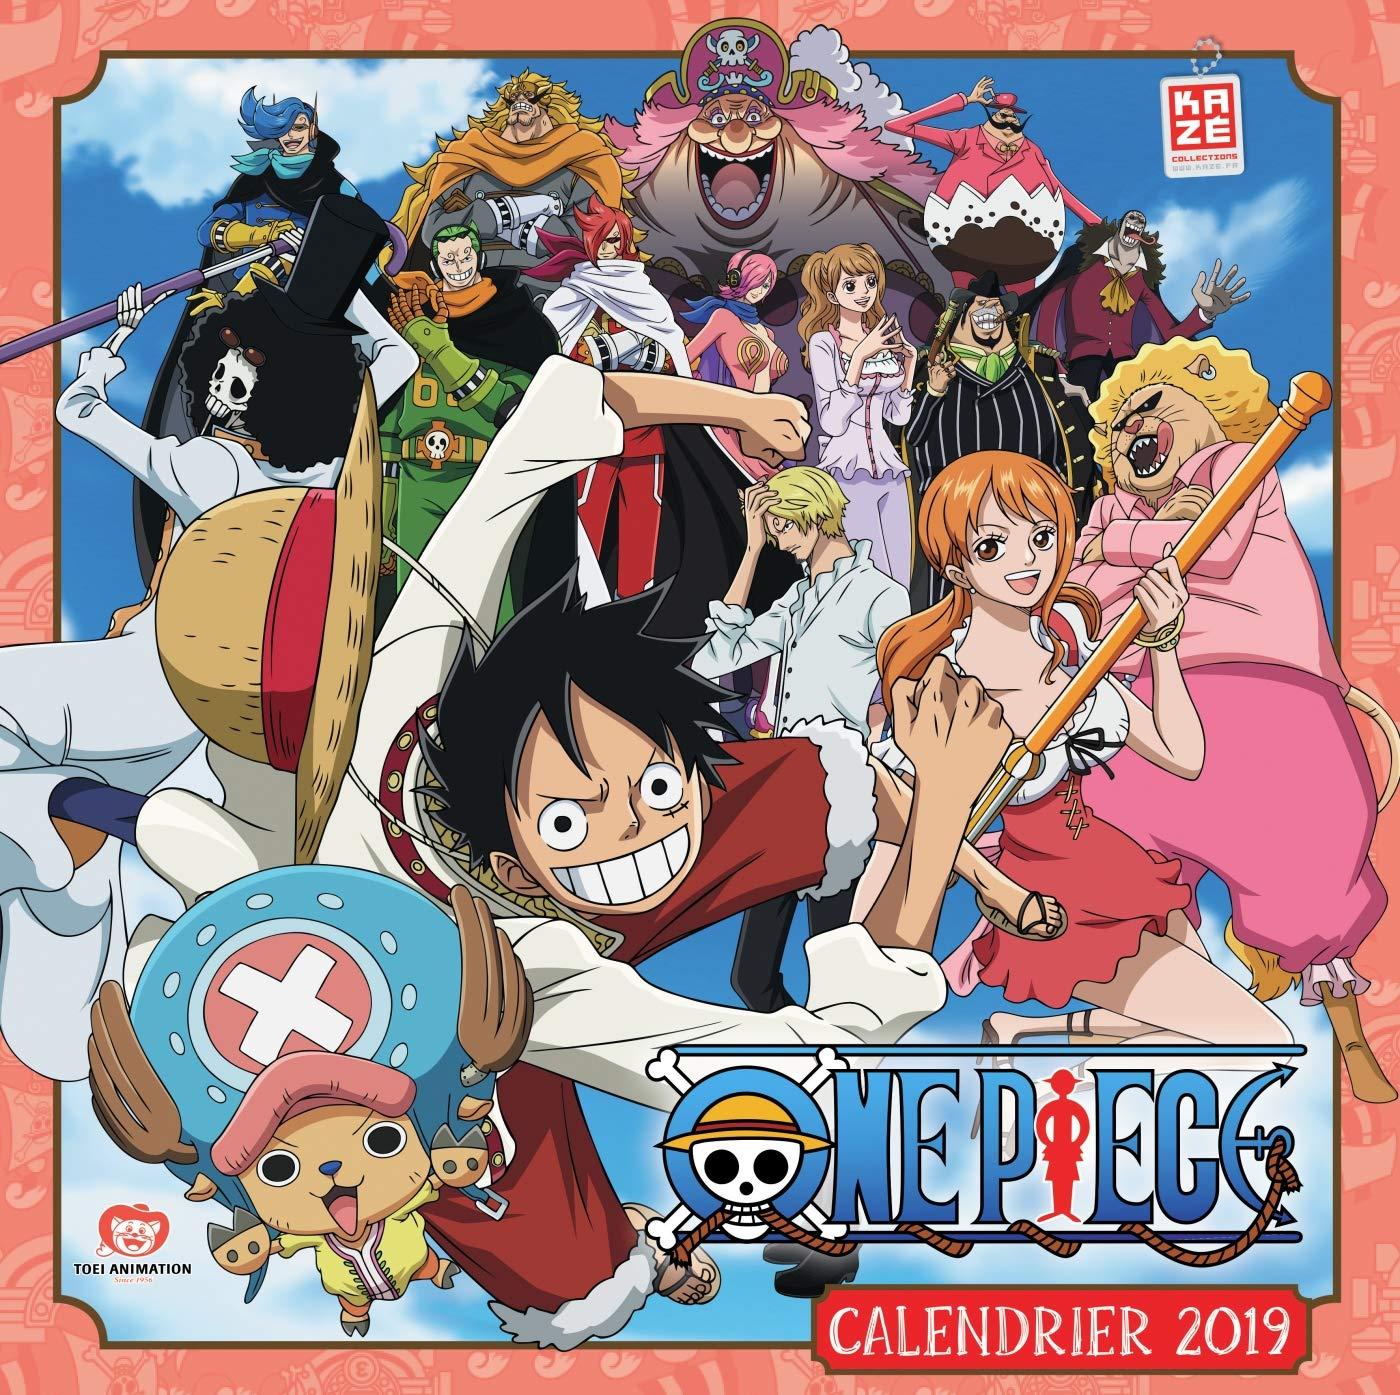 Calendrier 2019 One Piece Amazon Fr Kaze Livres